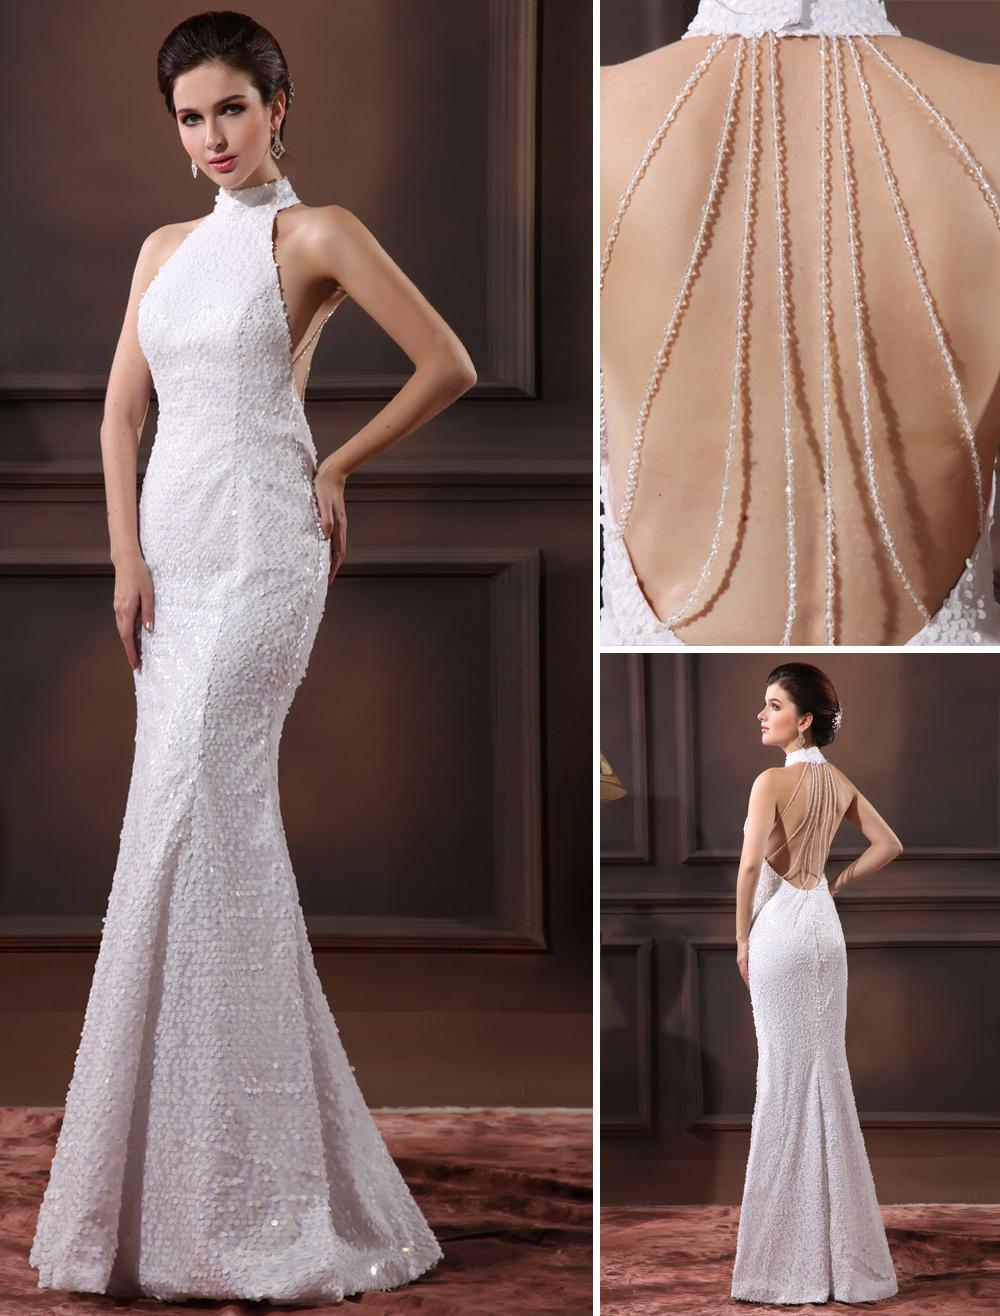 Glamorous White Sequined Halter Sequin Mermaid Wedding Dress For Bride Milanoo